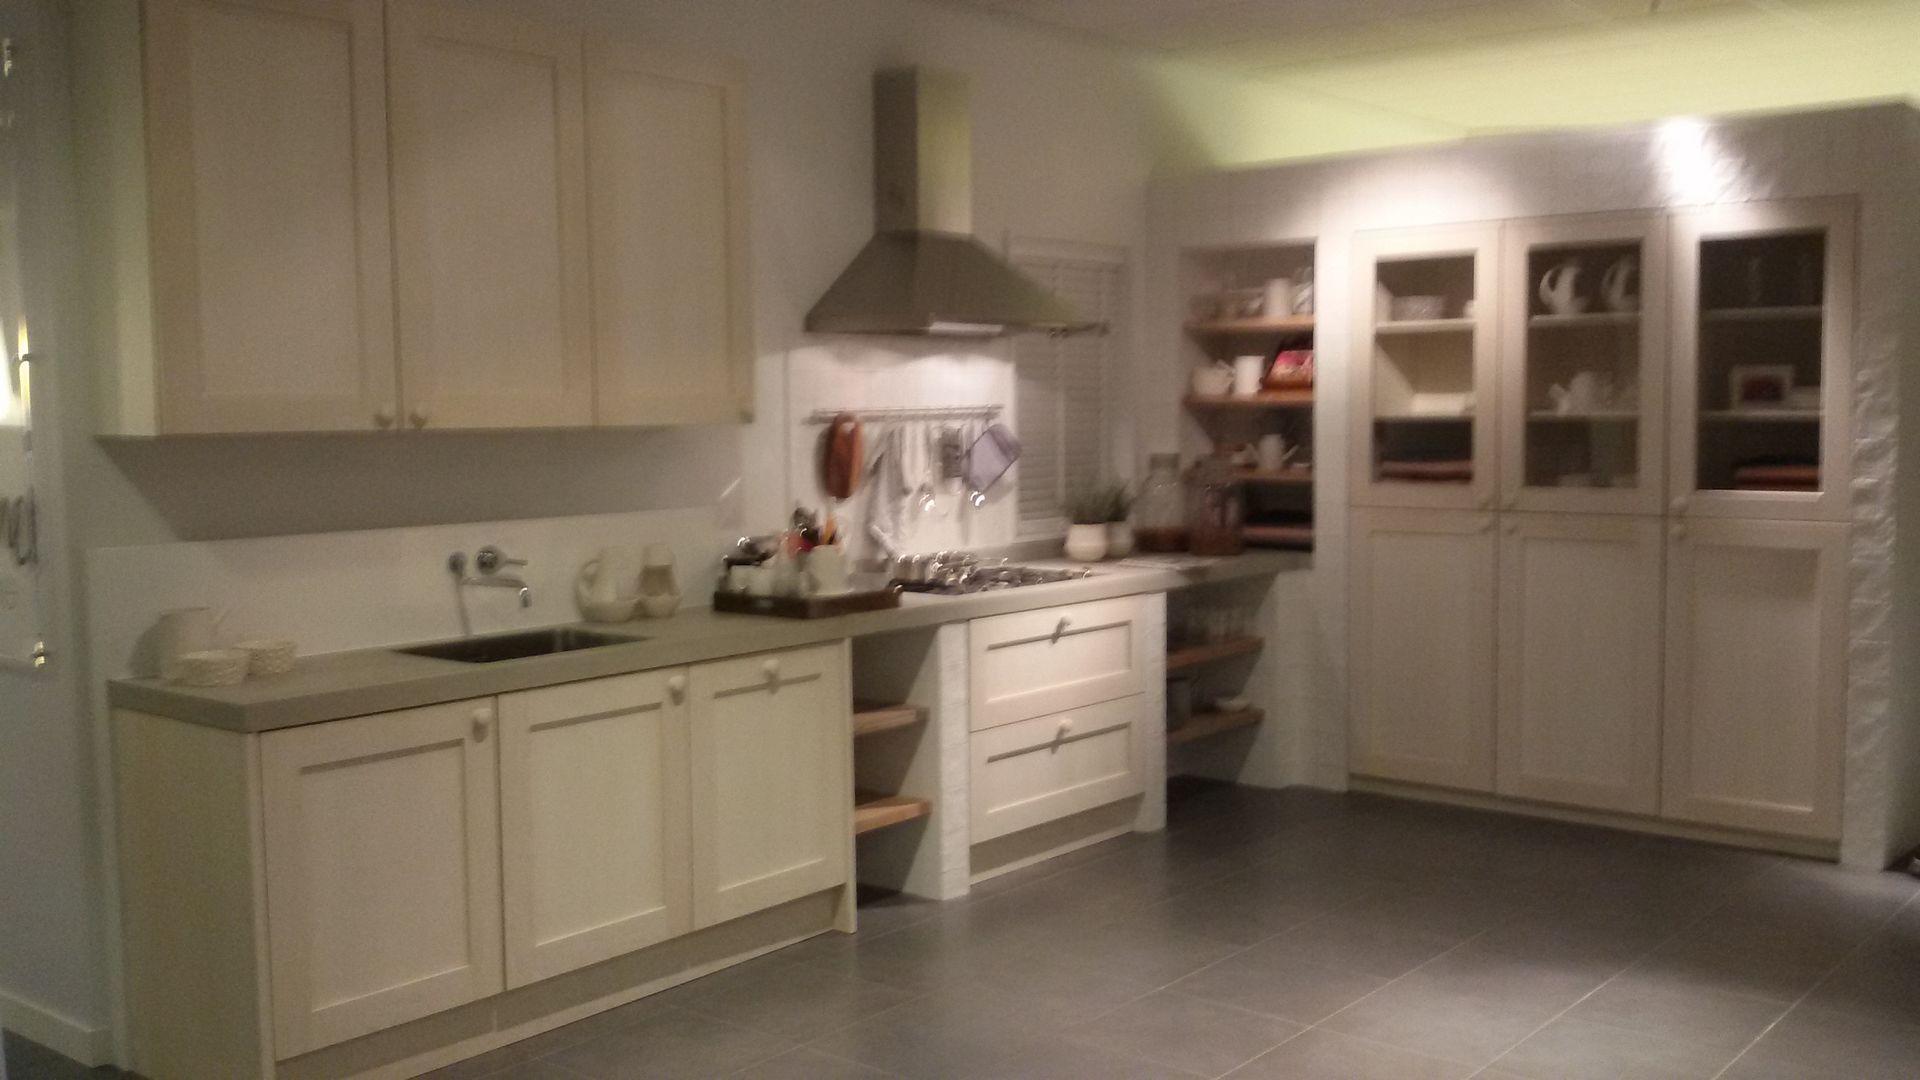 Showroomkeuken Ice Grey CVT keukens Tilburg